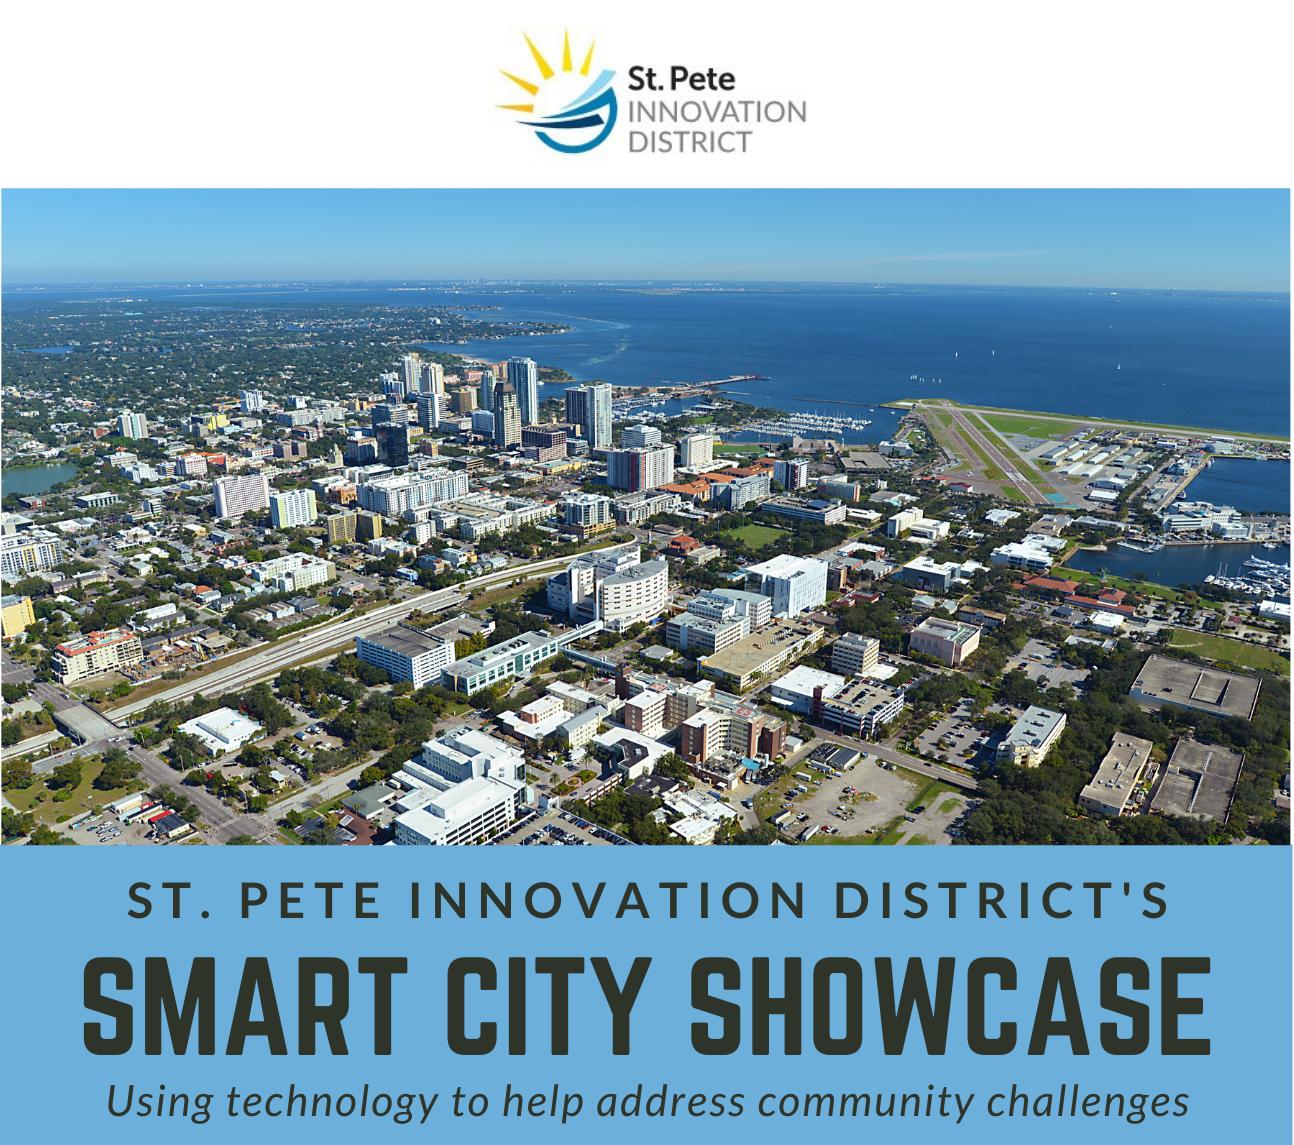 Flyer for Smart City Showcase